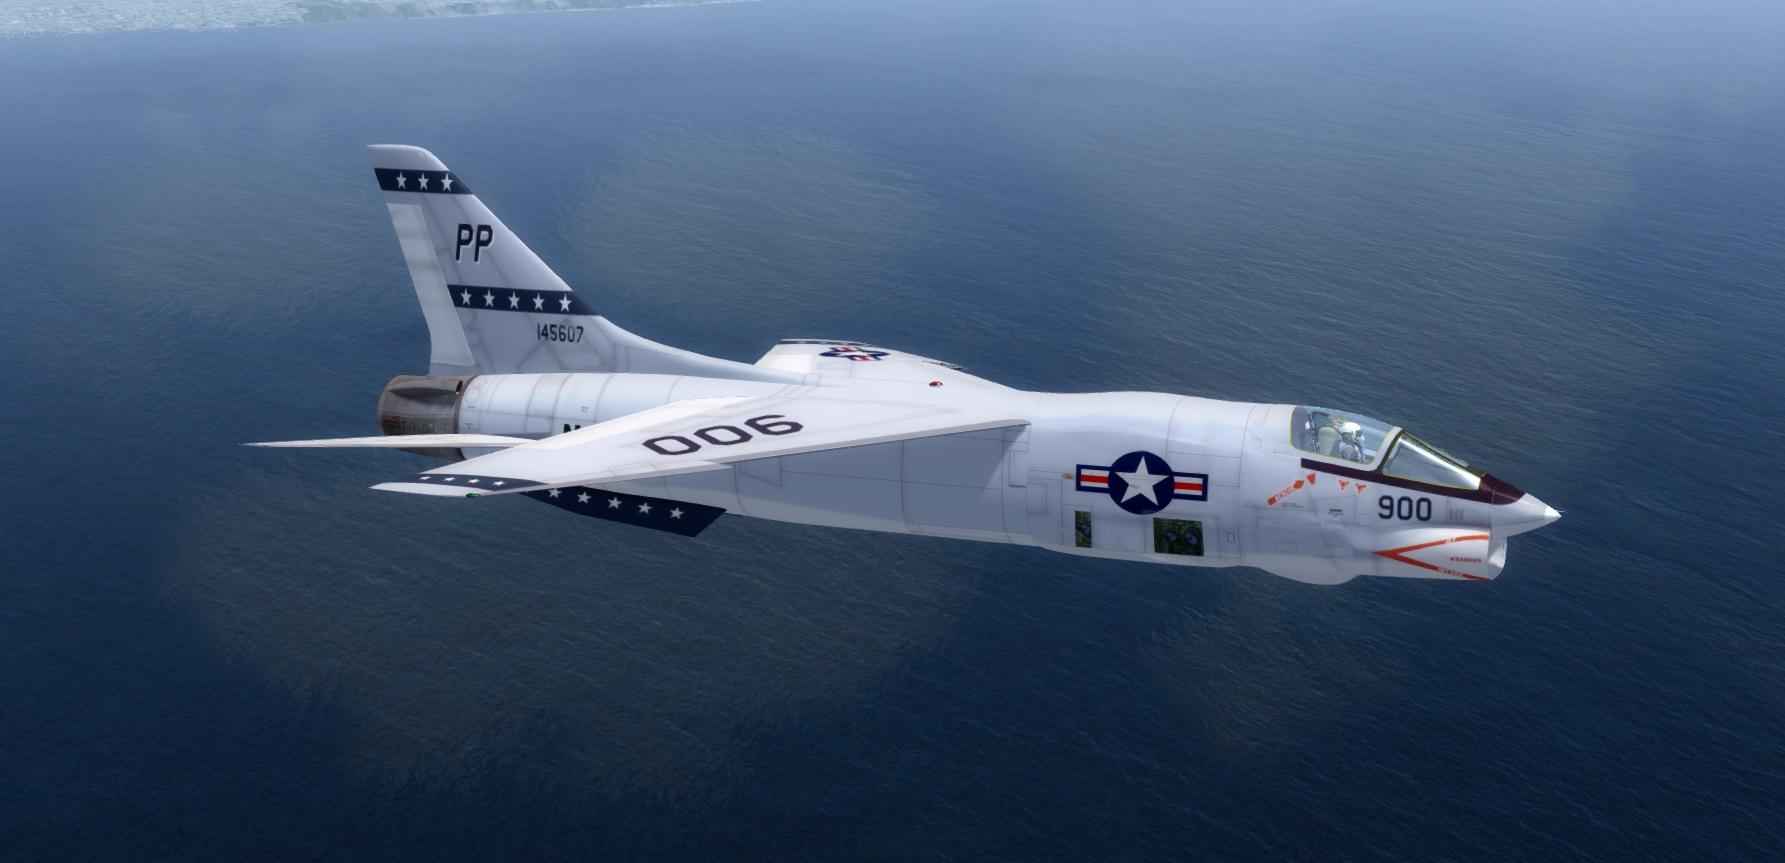 RF-8G_P3D.jpg